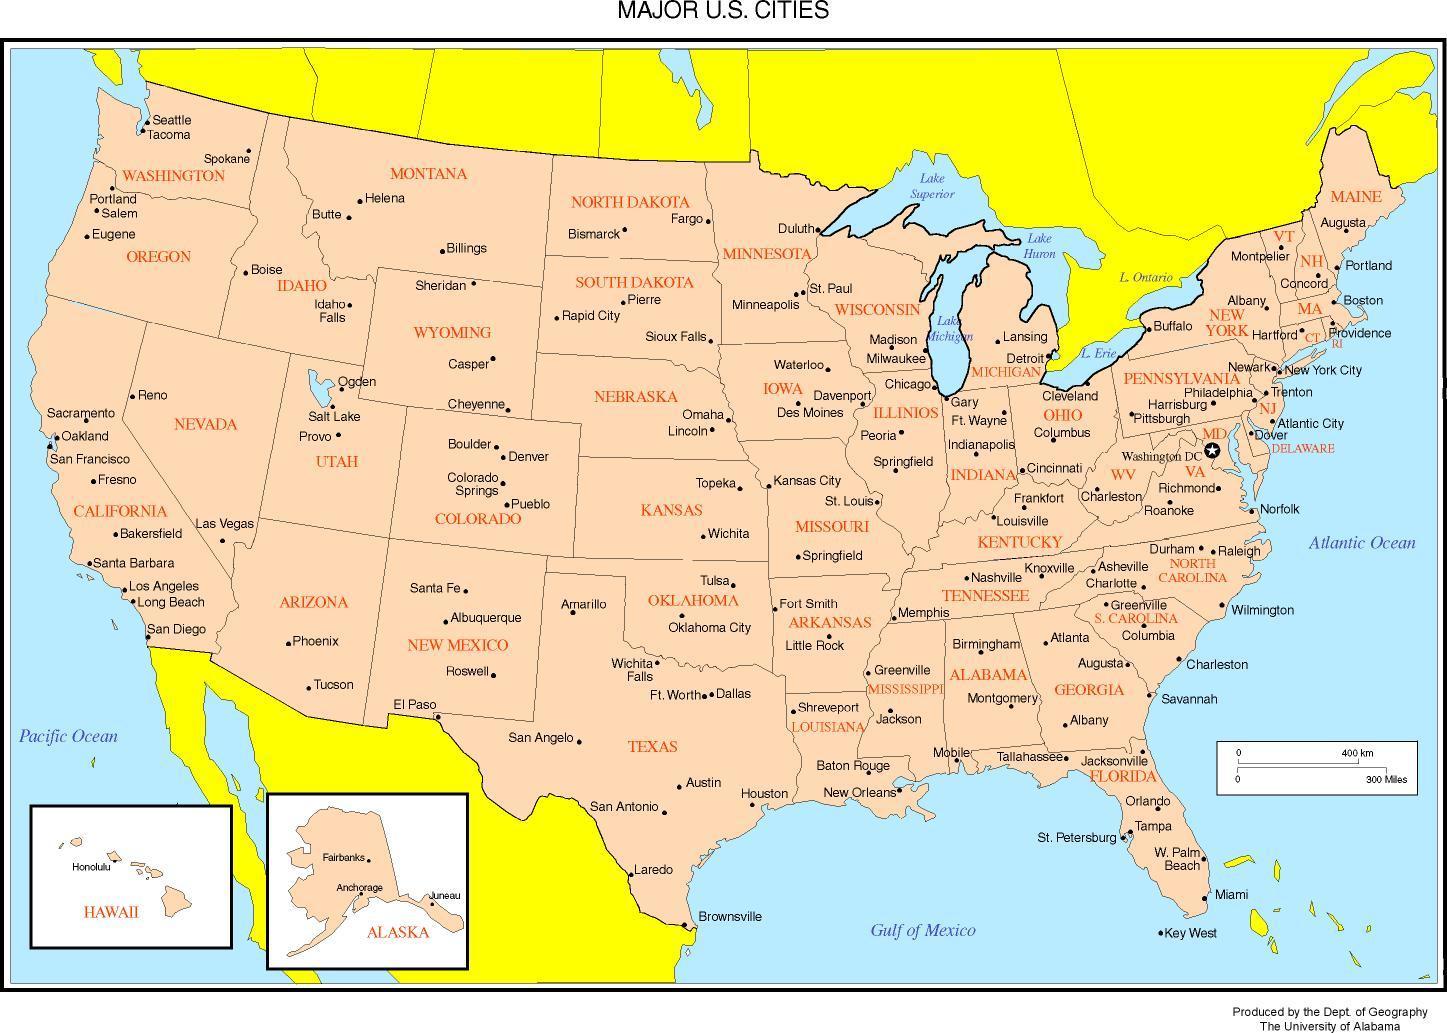 usa kart med byer Kart over USA som viser byer   Kart over USA viser større byer  usa kart med byer